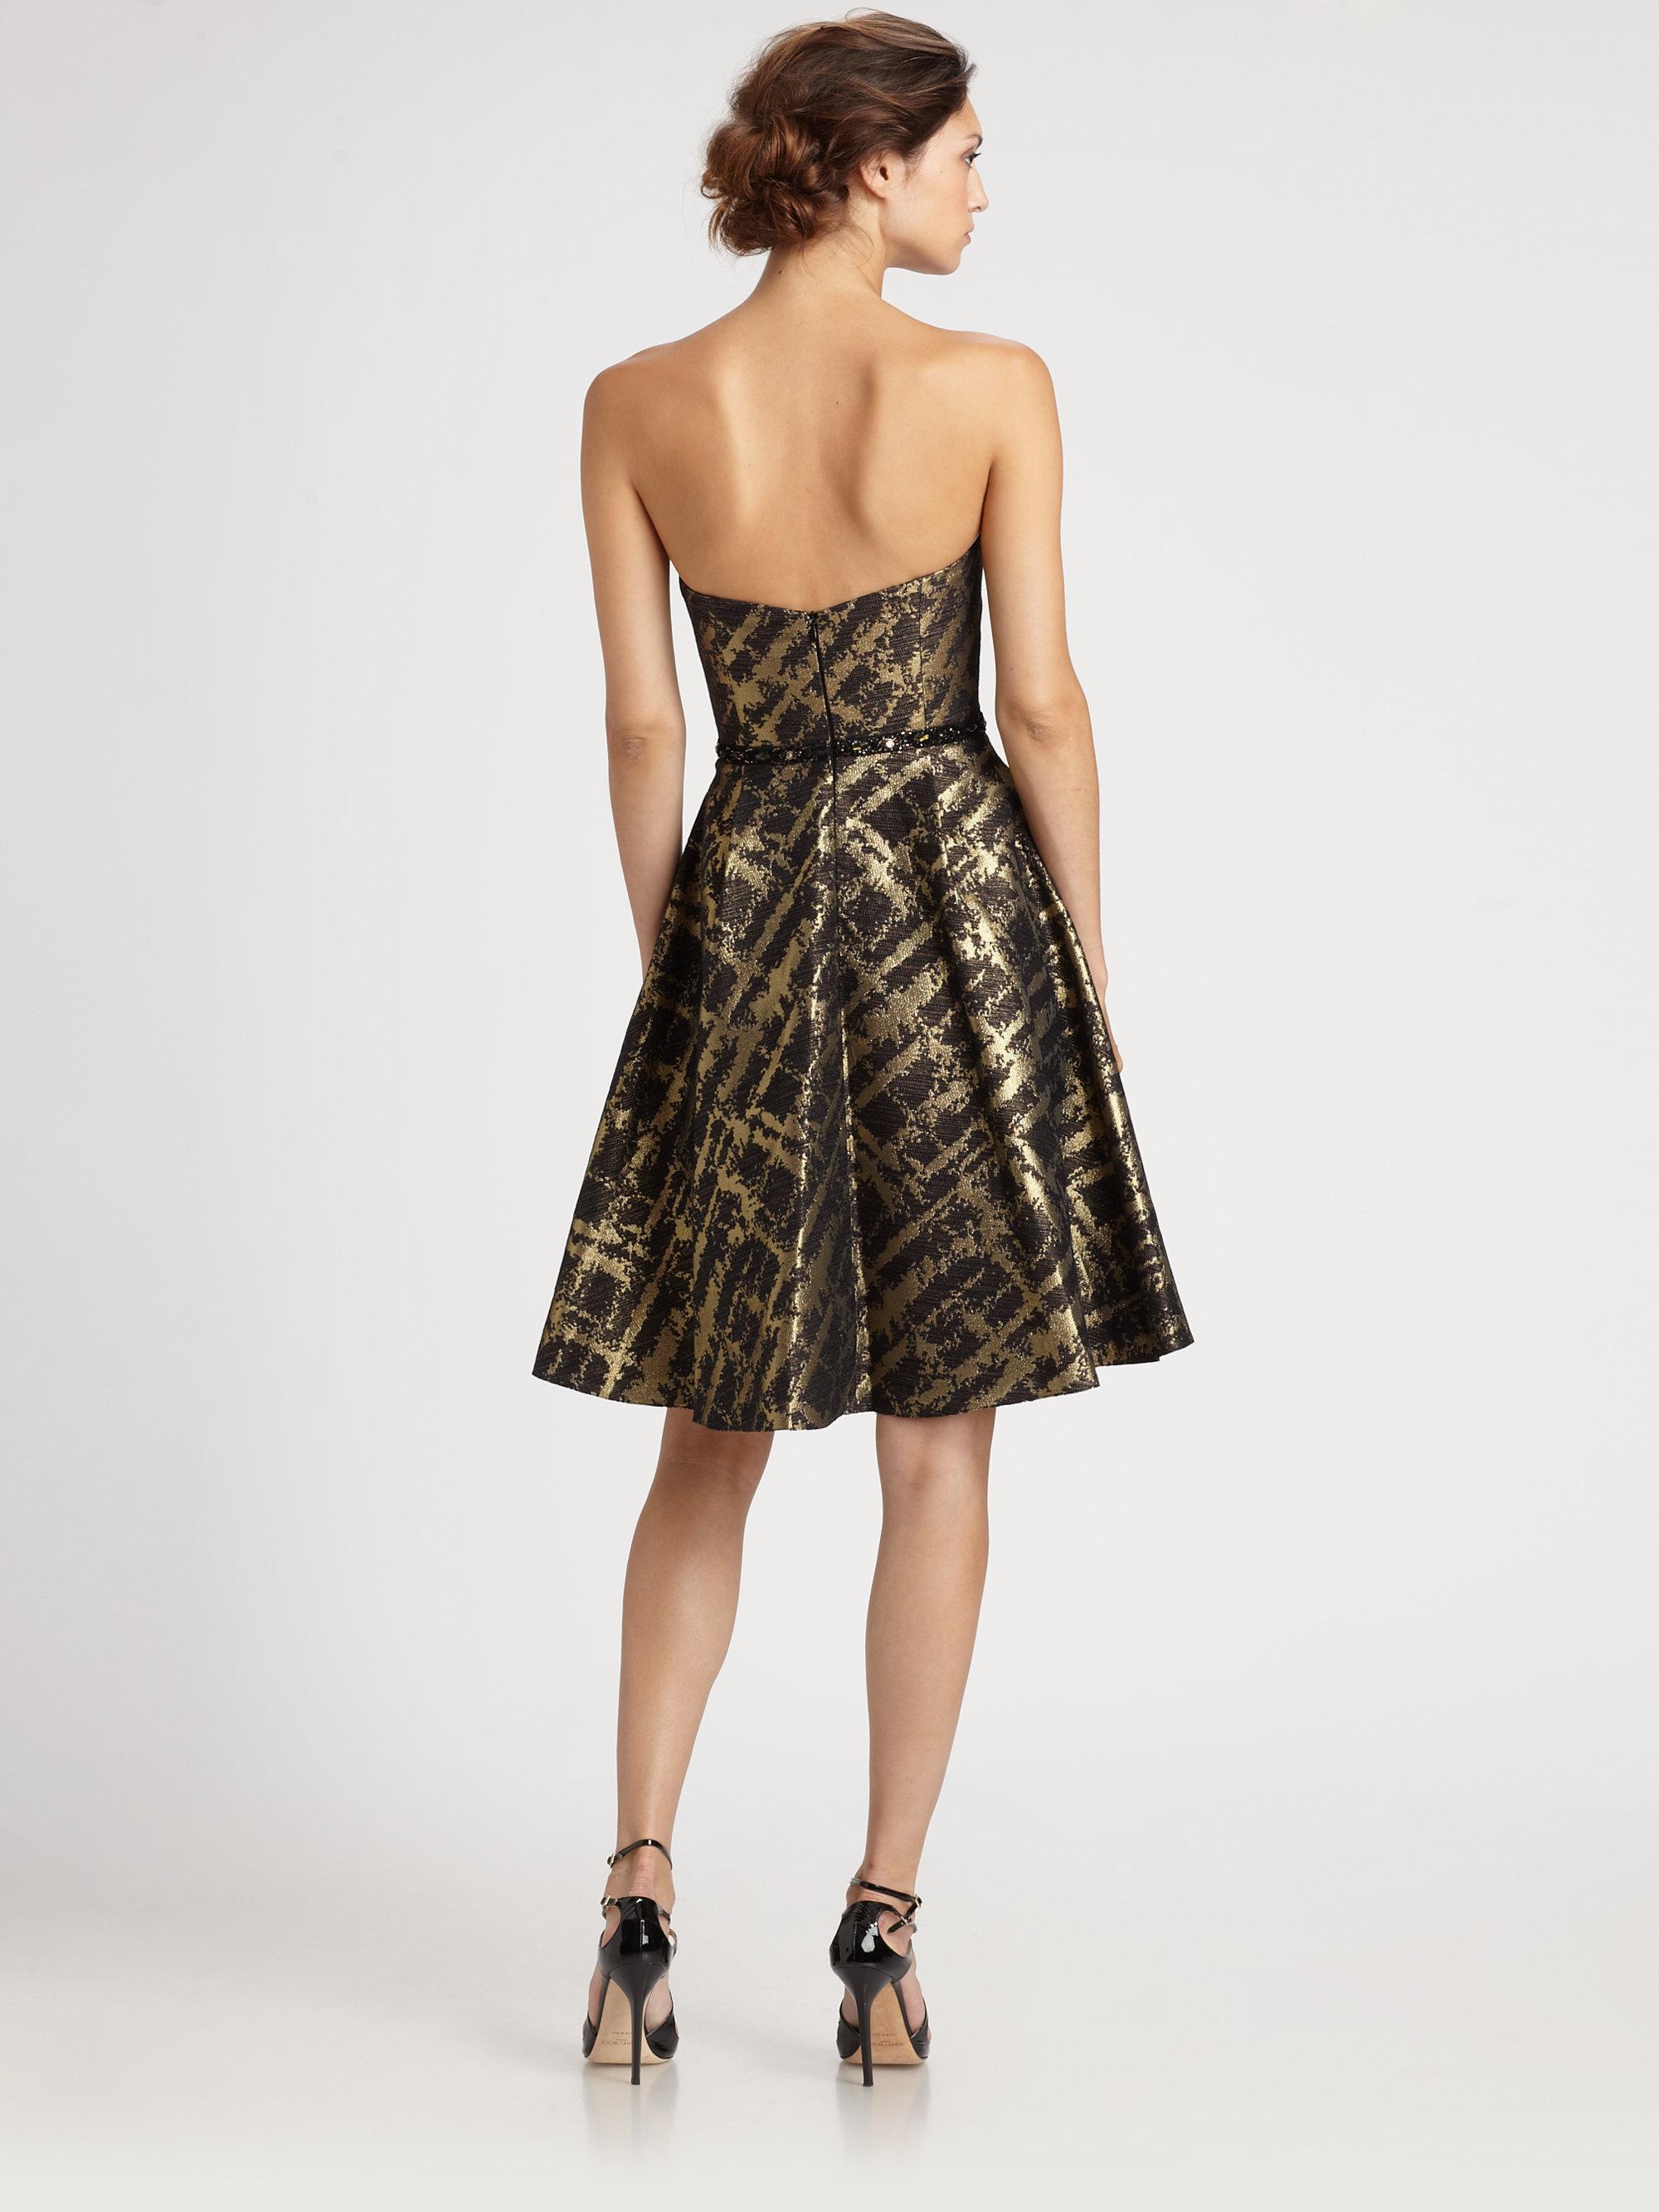 Lyst Ml Monique Lhuillier Brocade Dress In Black